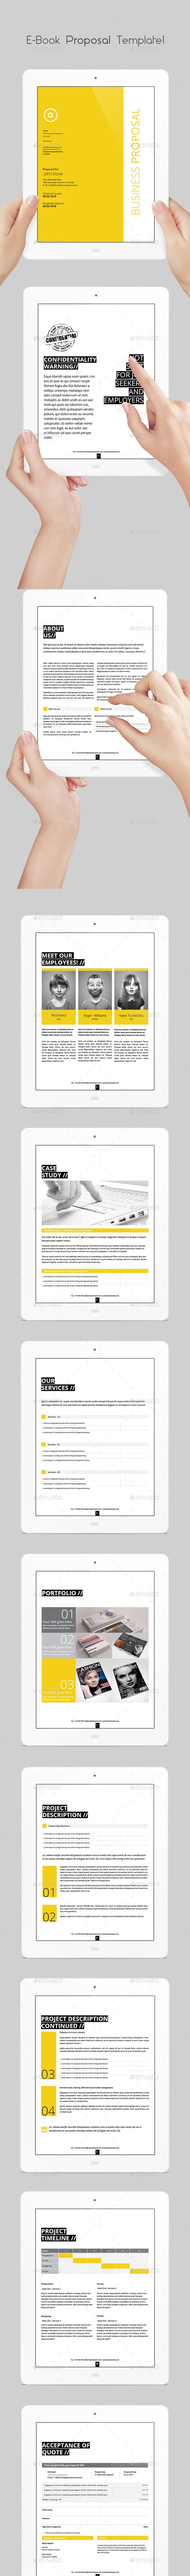 E-book Proposal Template - ePublishing